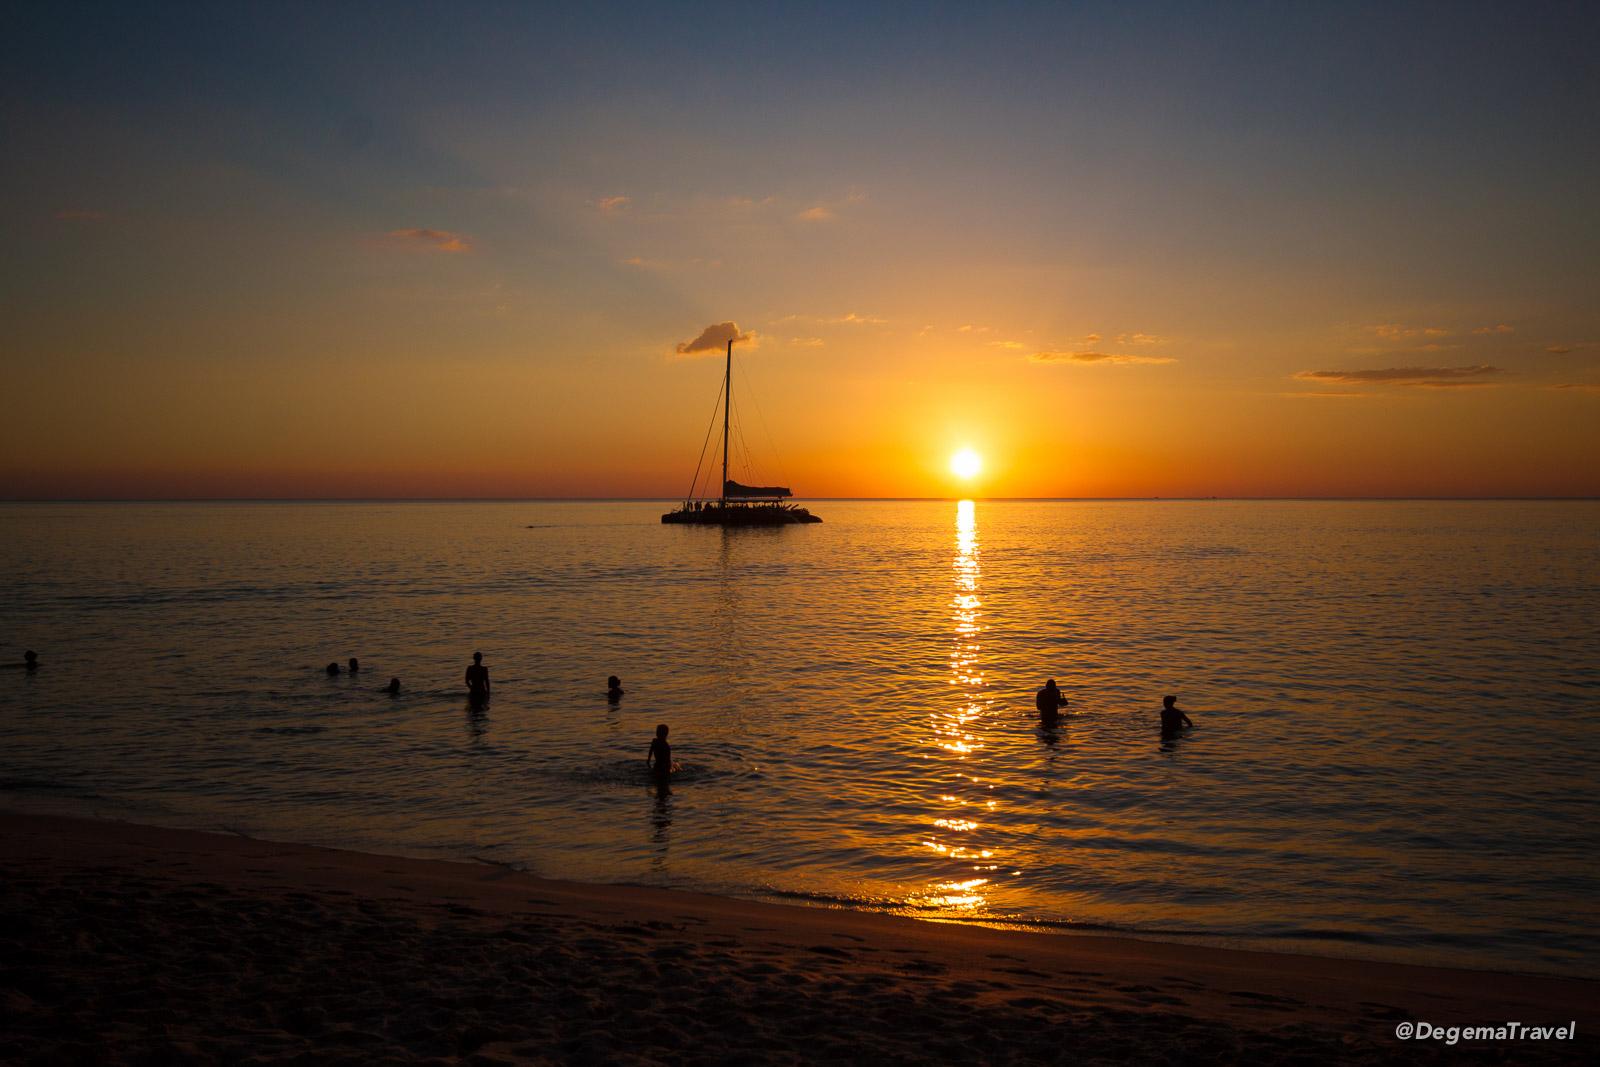 Sunset at Surin Beach in Phuket, Thailand